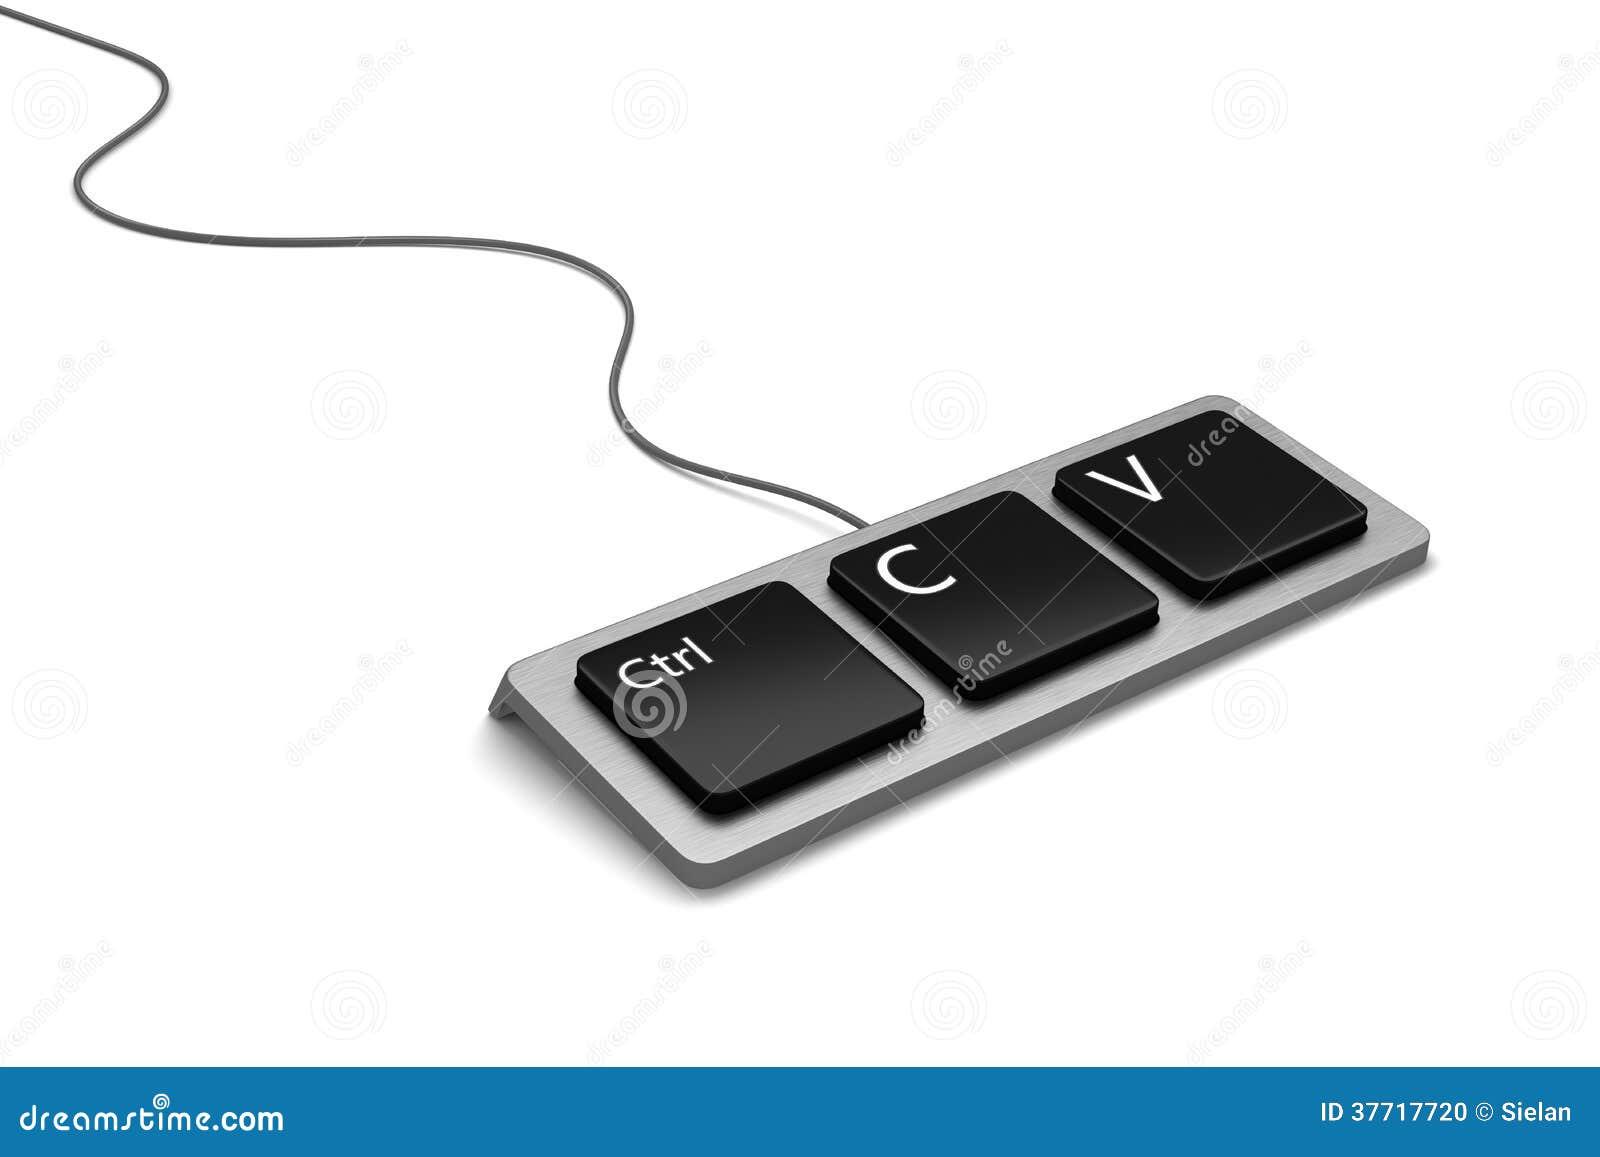 Copy paste keyboard plagiarist tool stock illustration copy paste keyboard plagiarist tool buycottarizona Choice Image